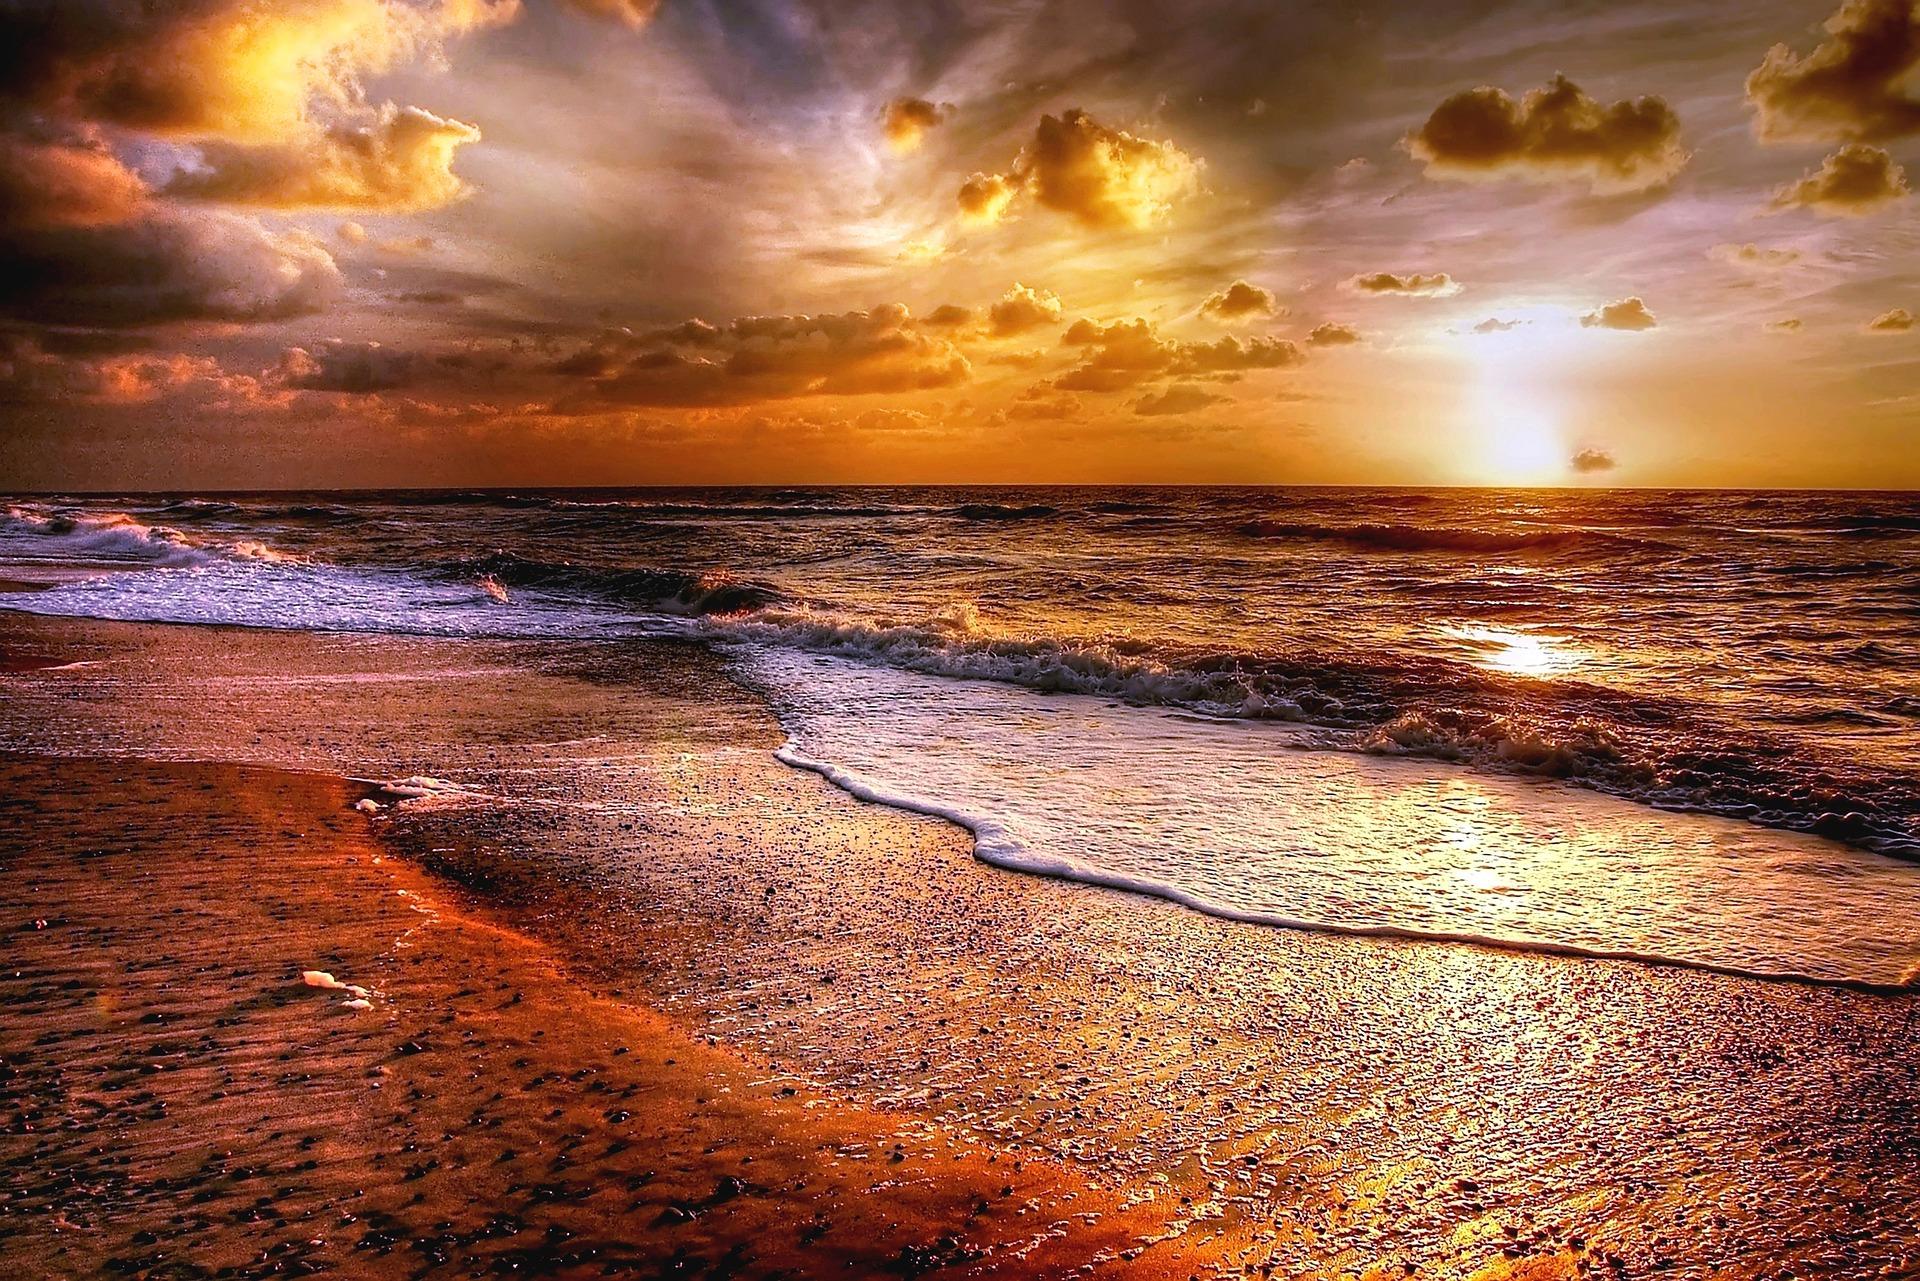 sunset-2210870_1920